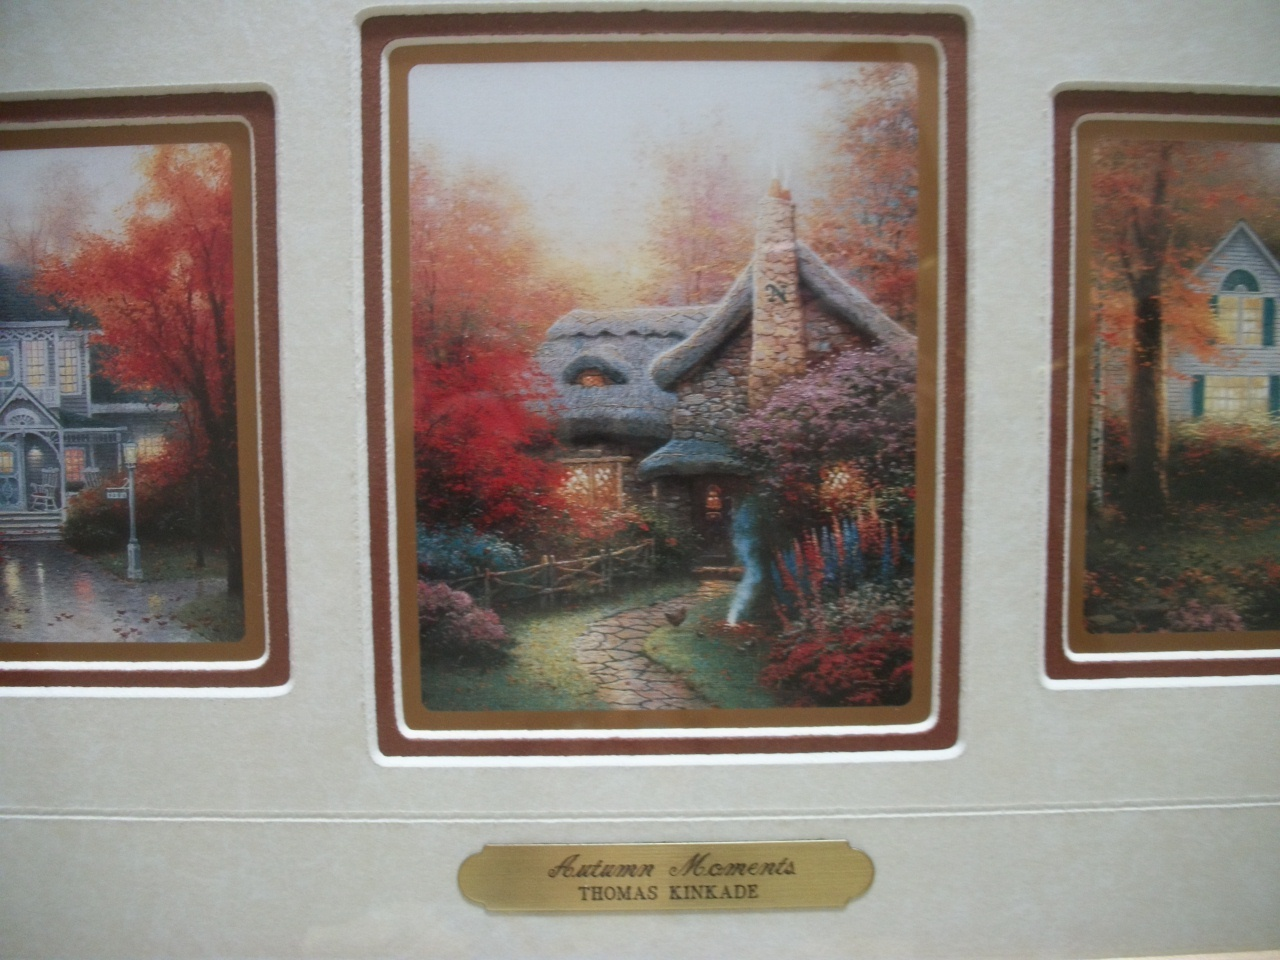 Thomas Kinkade Paintings Autumn Moments